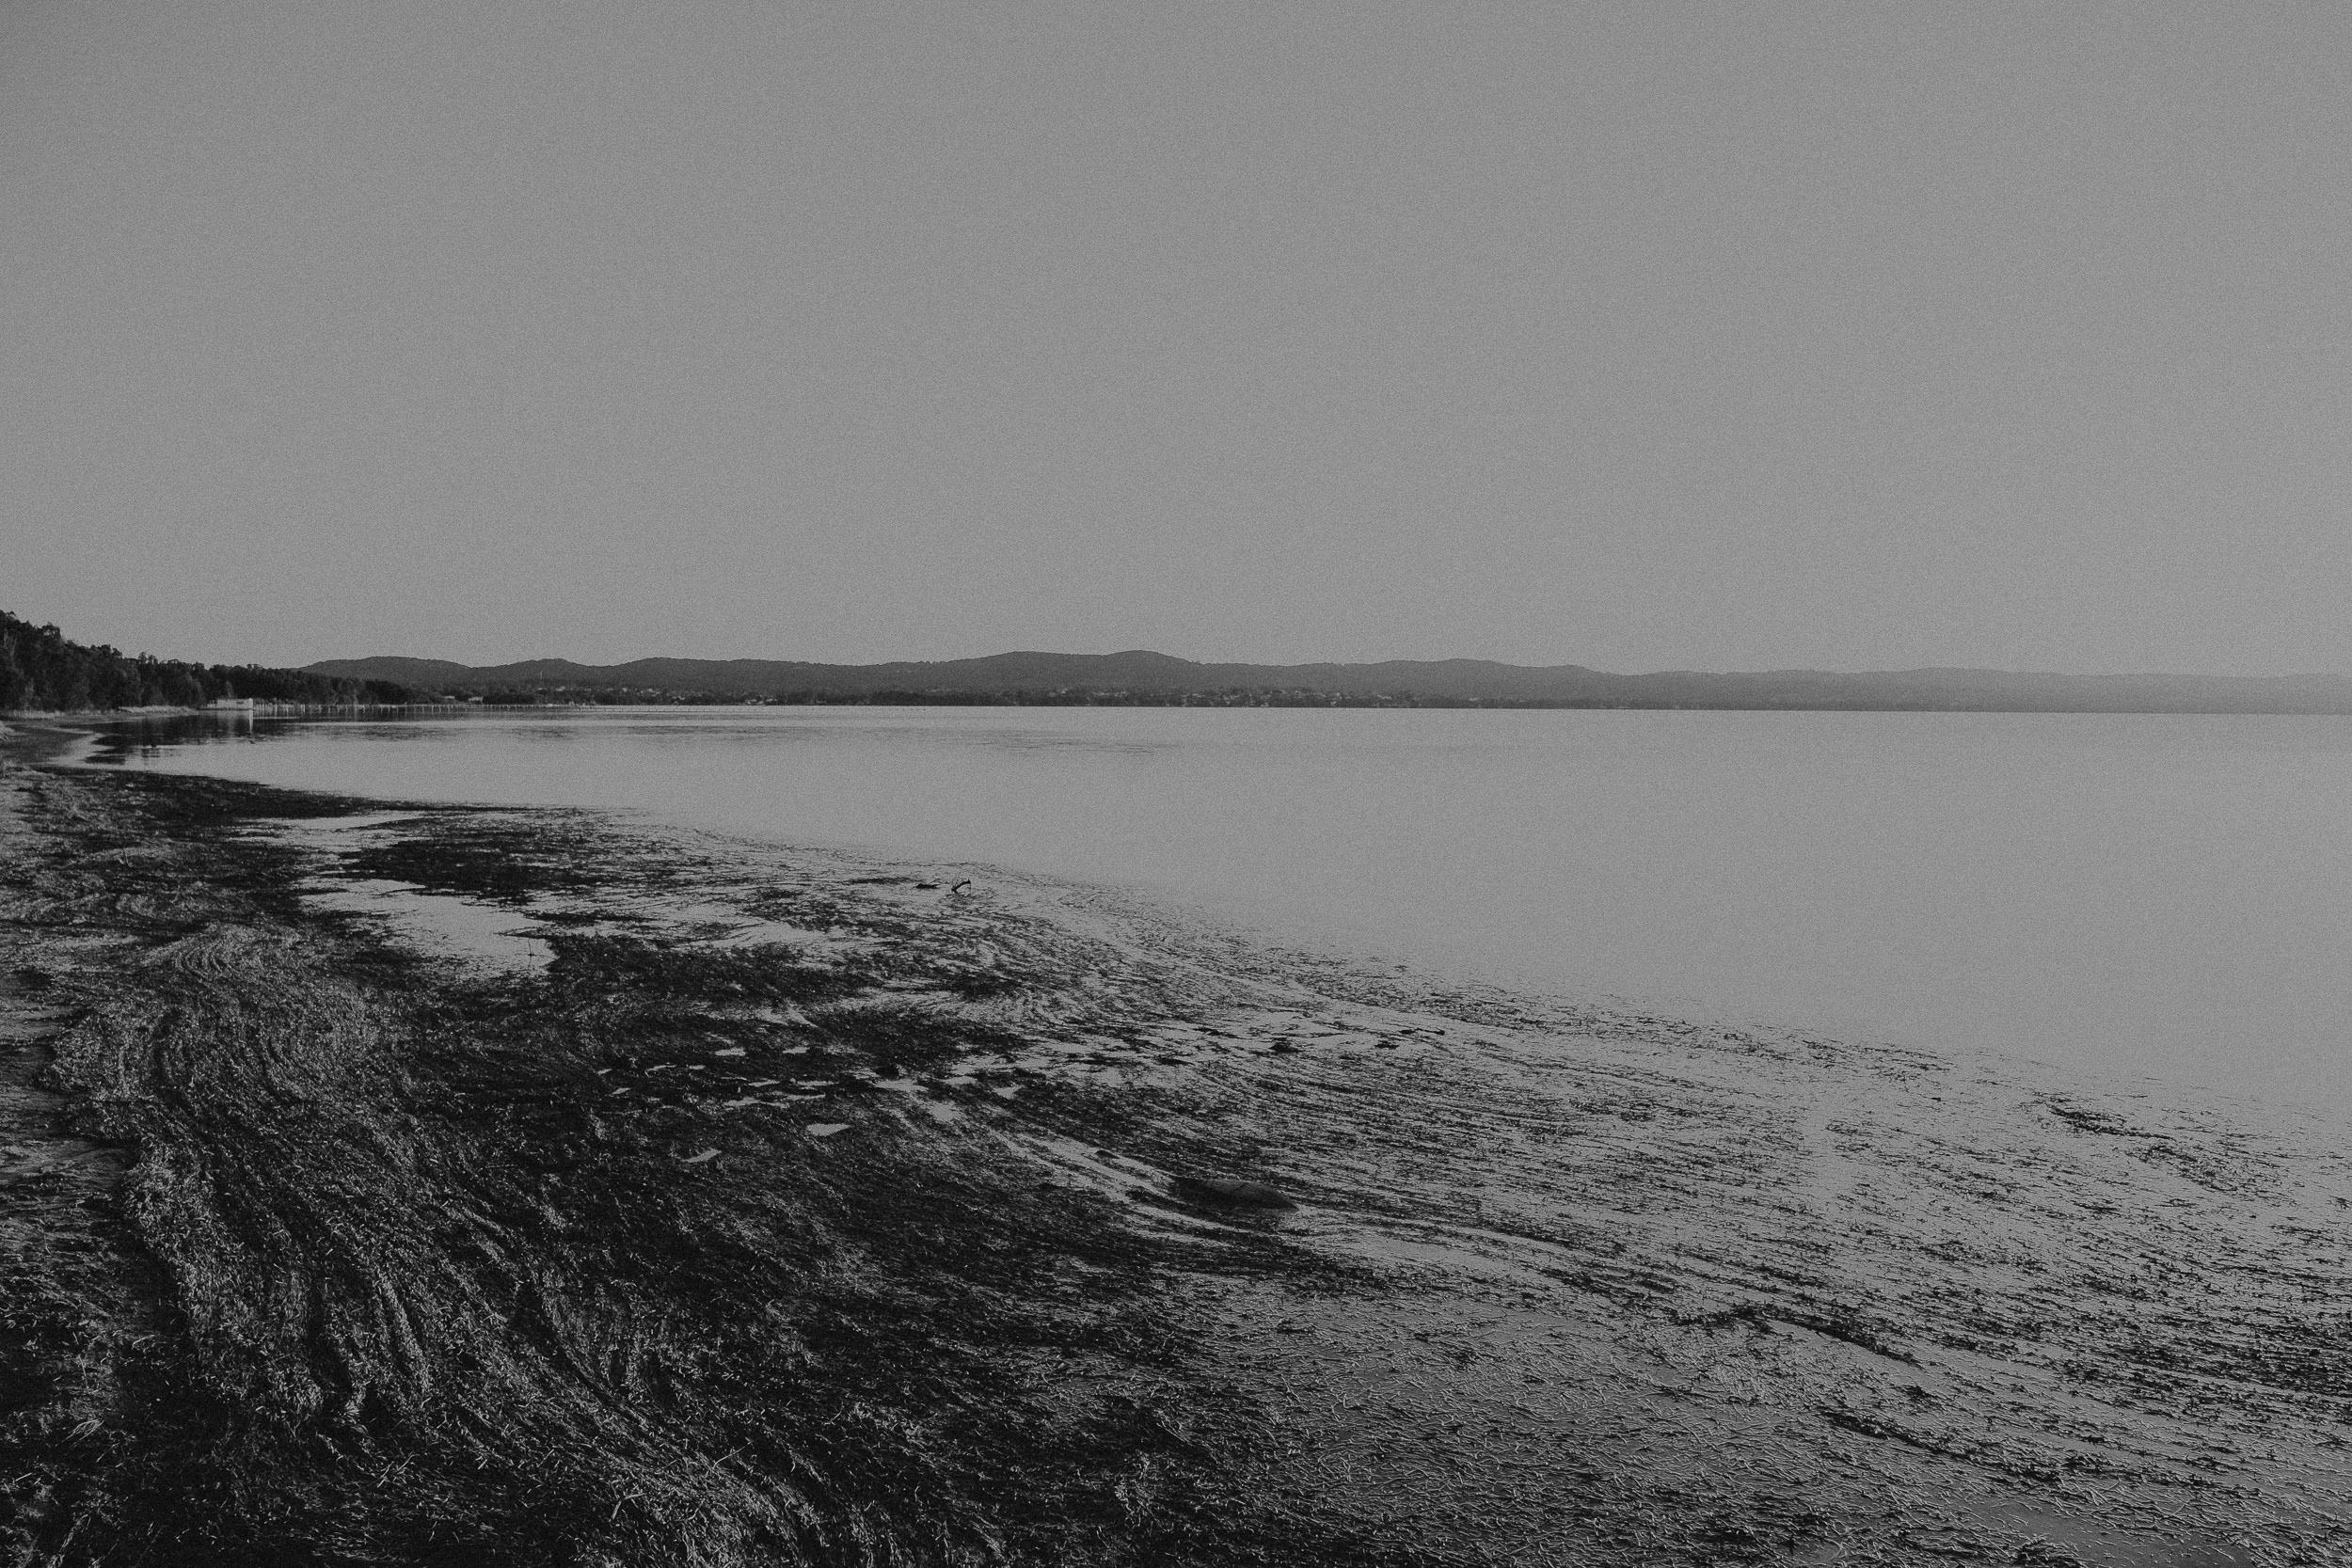 S&A Elopement - Kings & Thieves - Shred 'Til Dead - Central Coast Beach Forest Wedding - 367.jpg